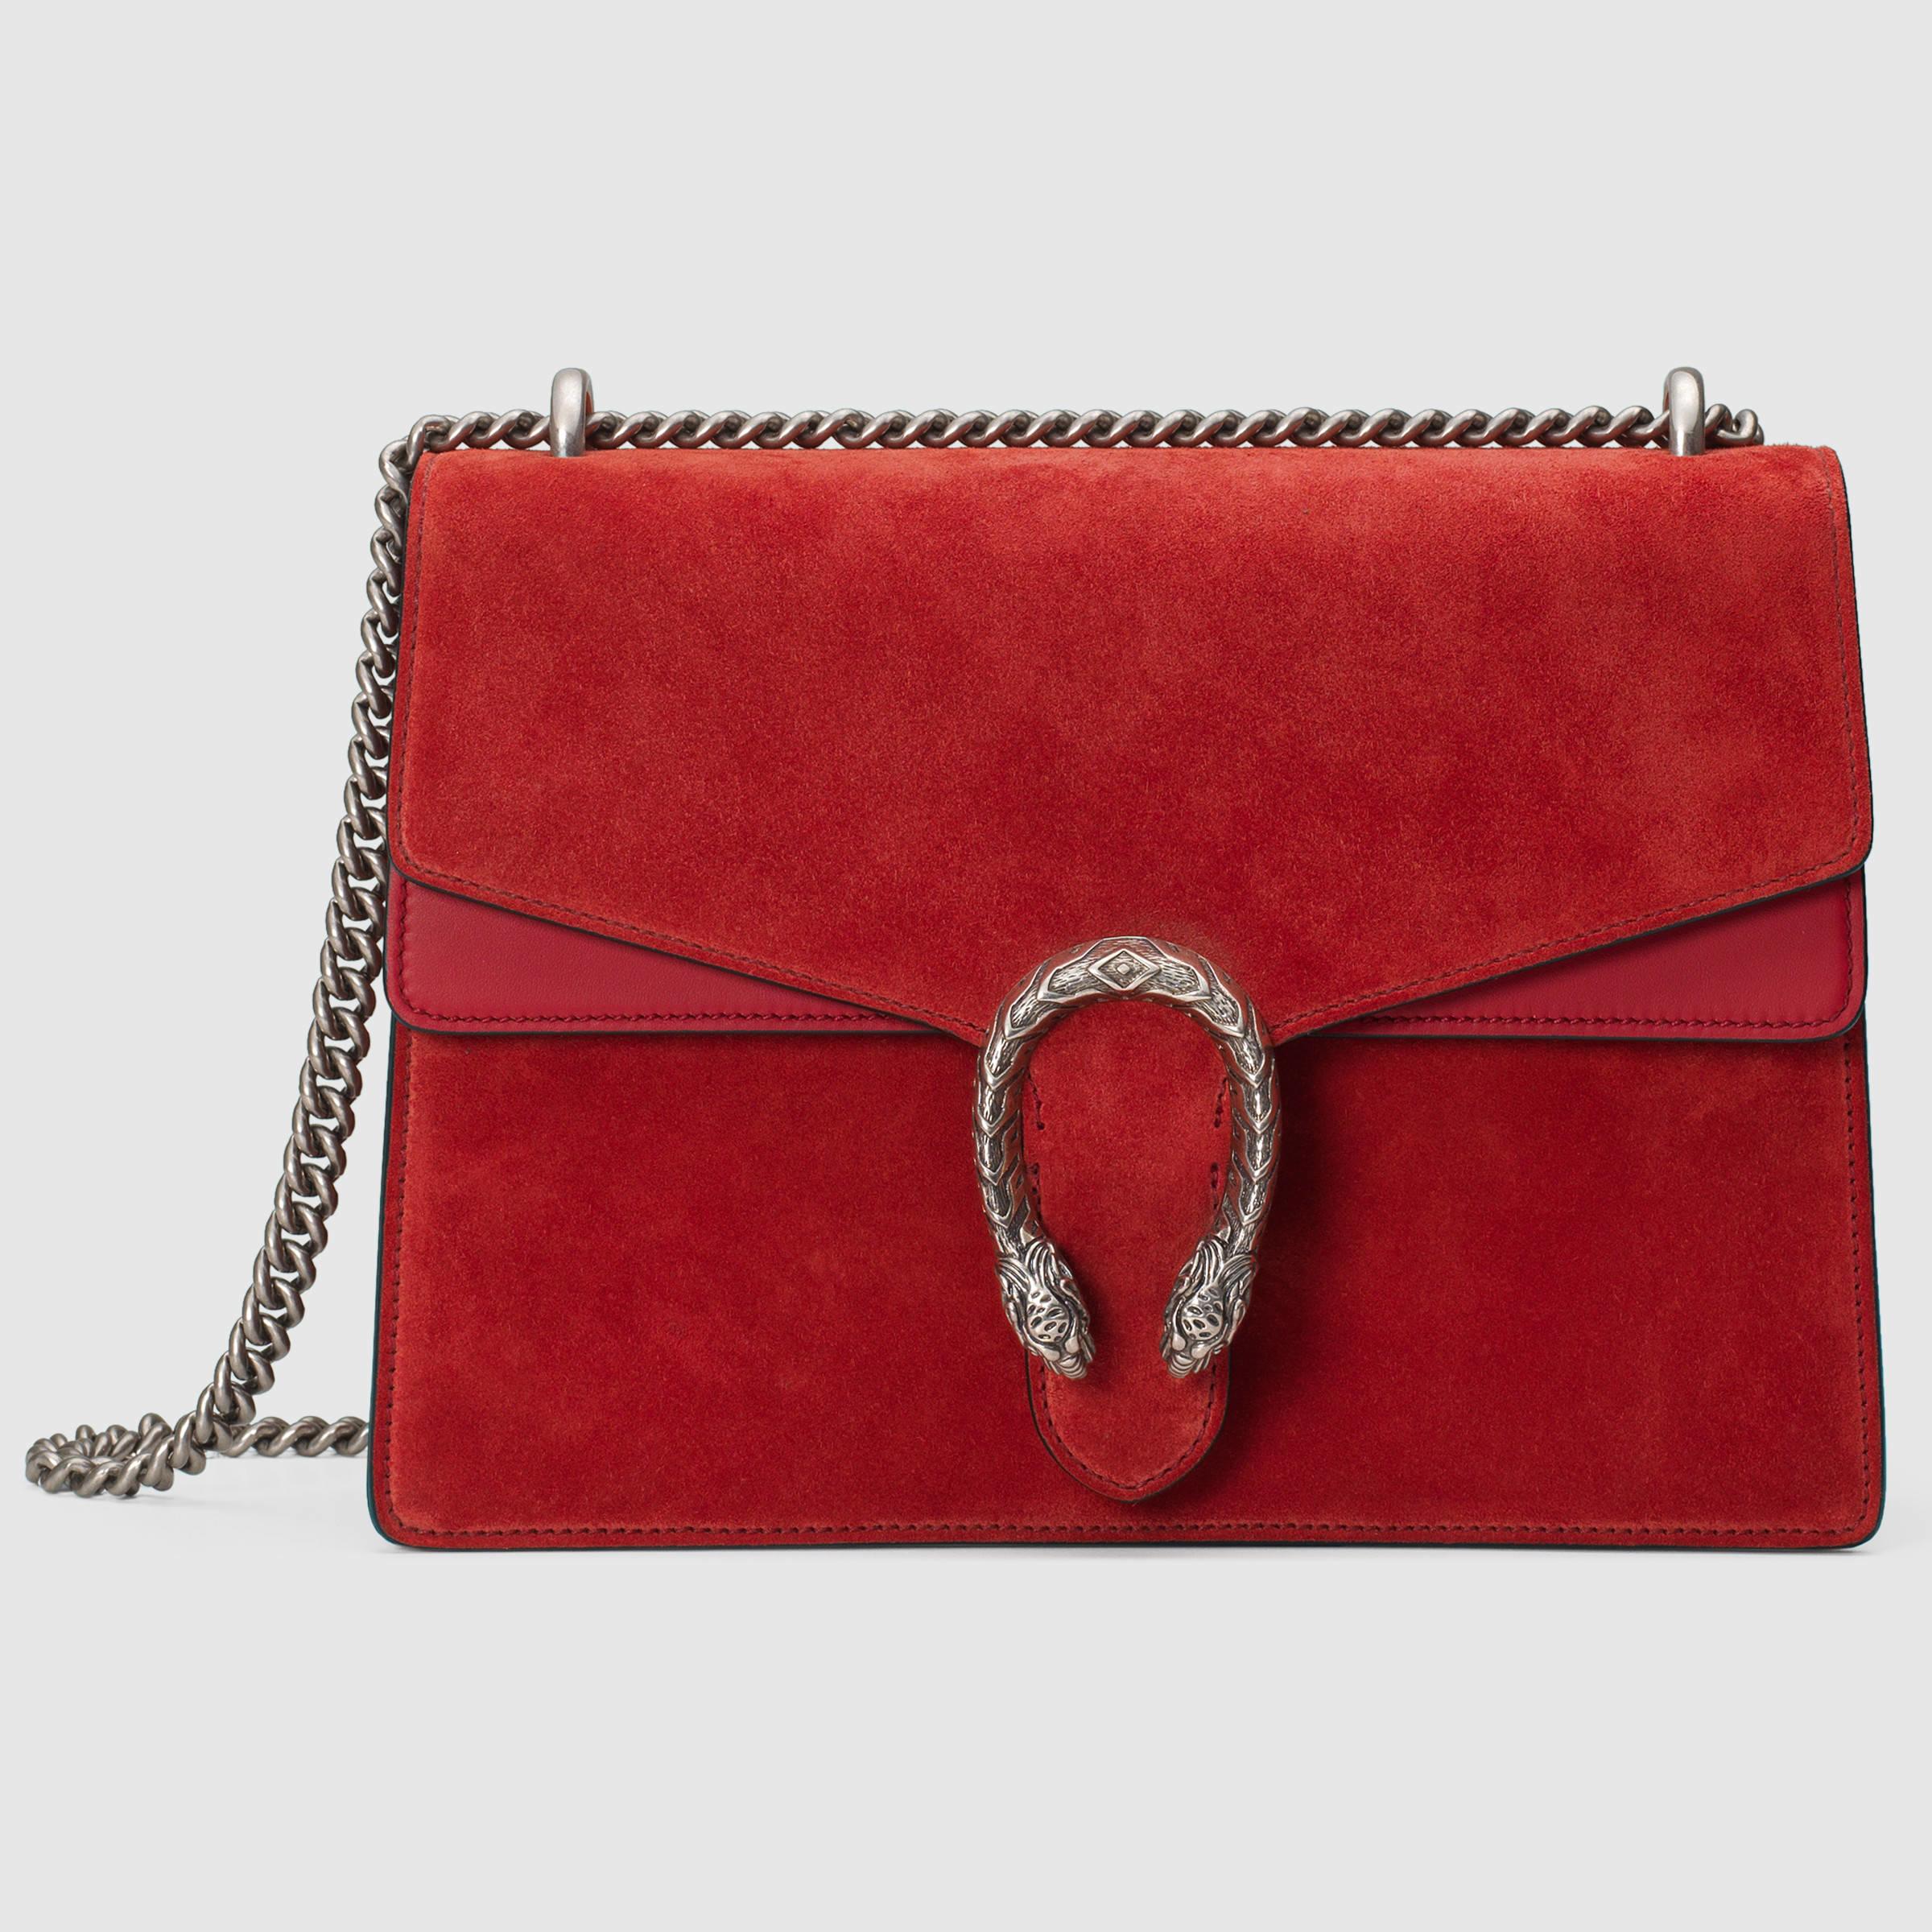 cf80a2c9 Gucci Dionysus Suede Shoulder Bag in Red - Lyst